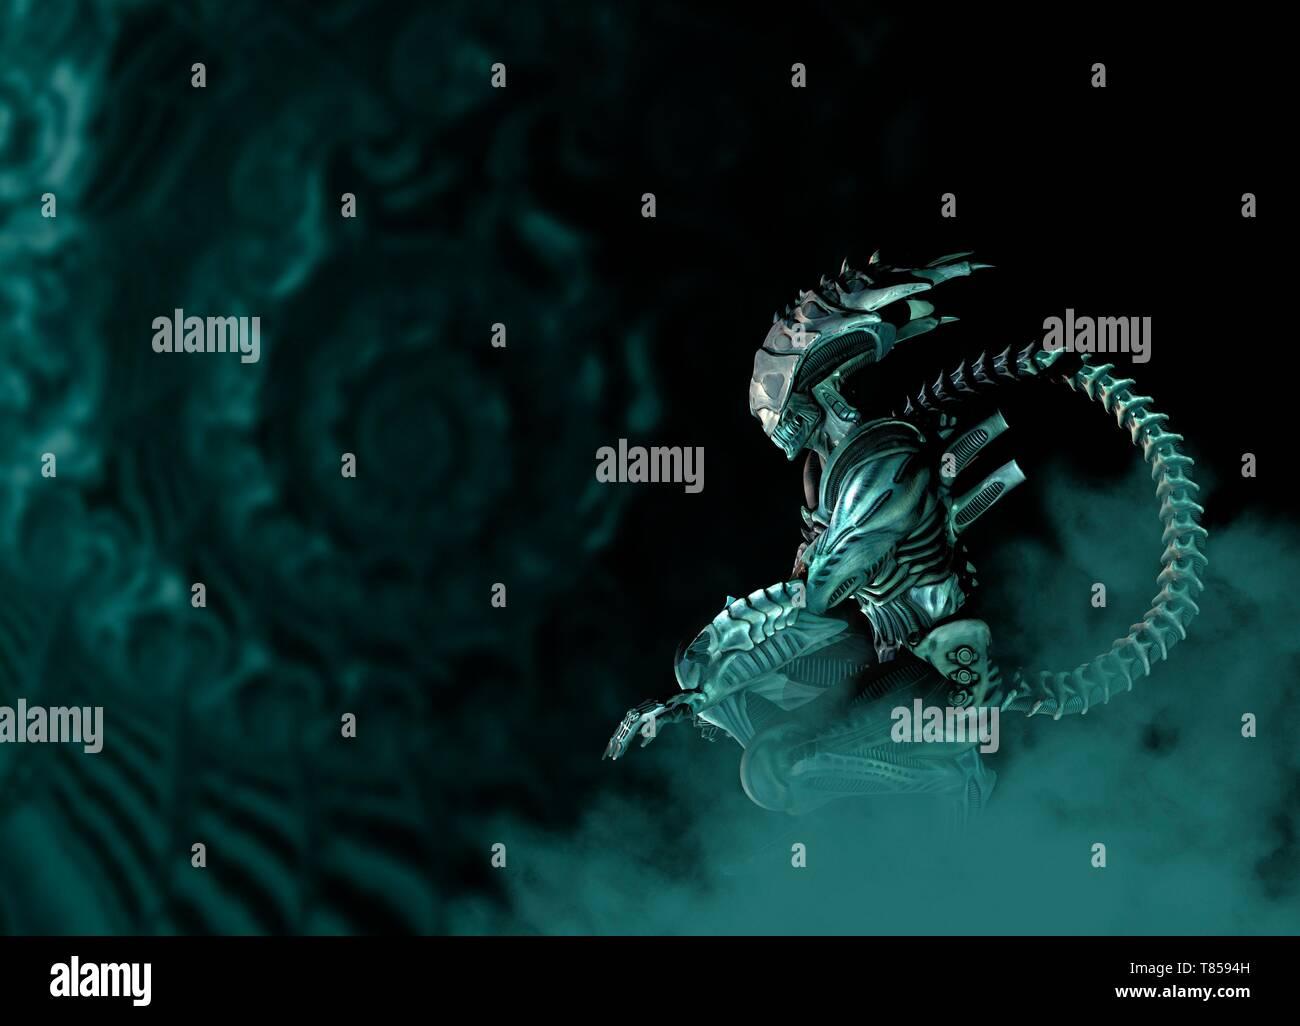 Alien, illustration - Stock Image